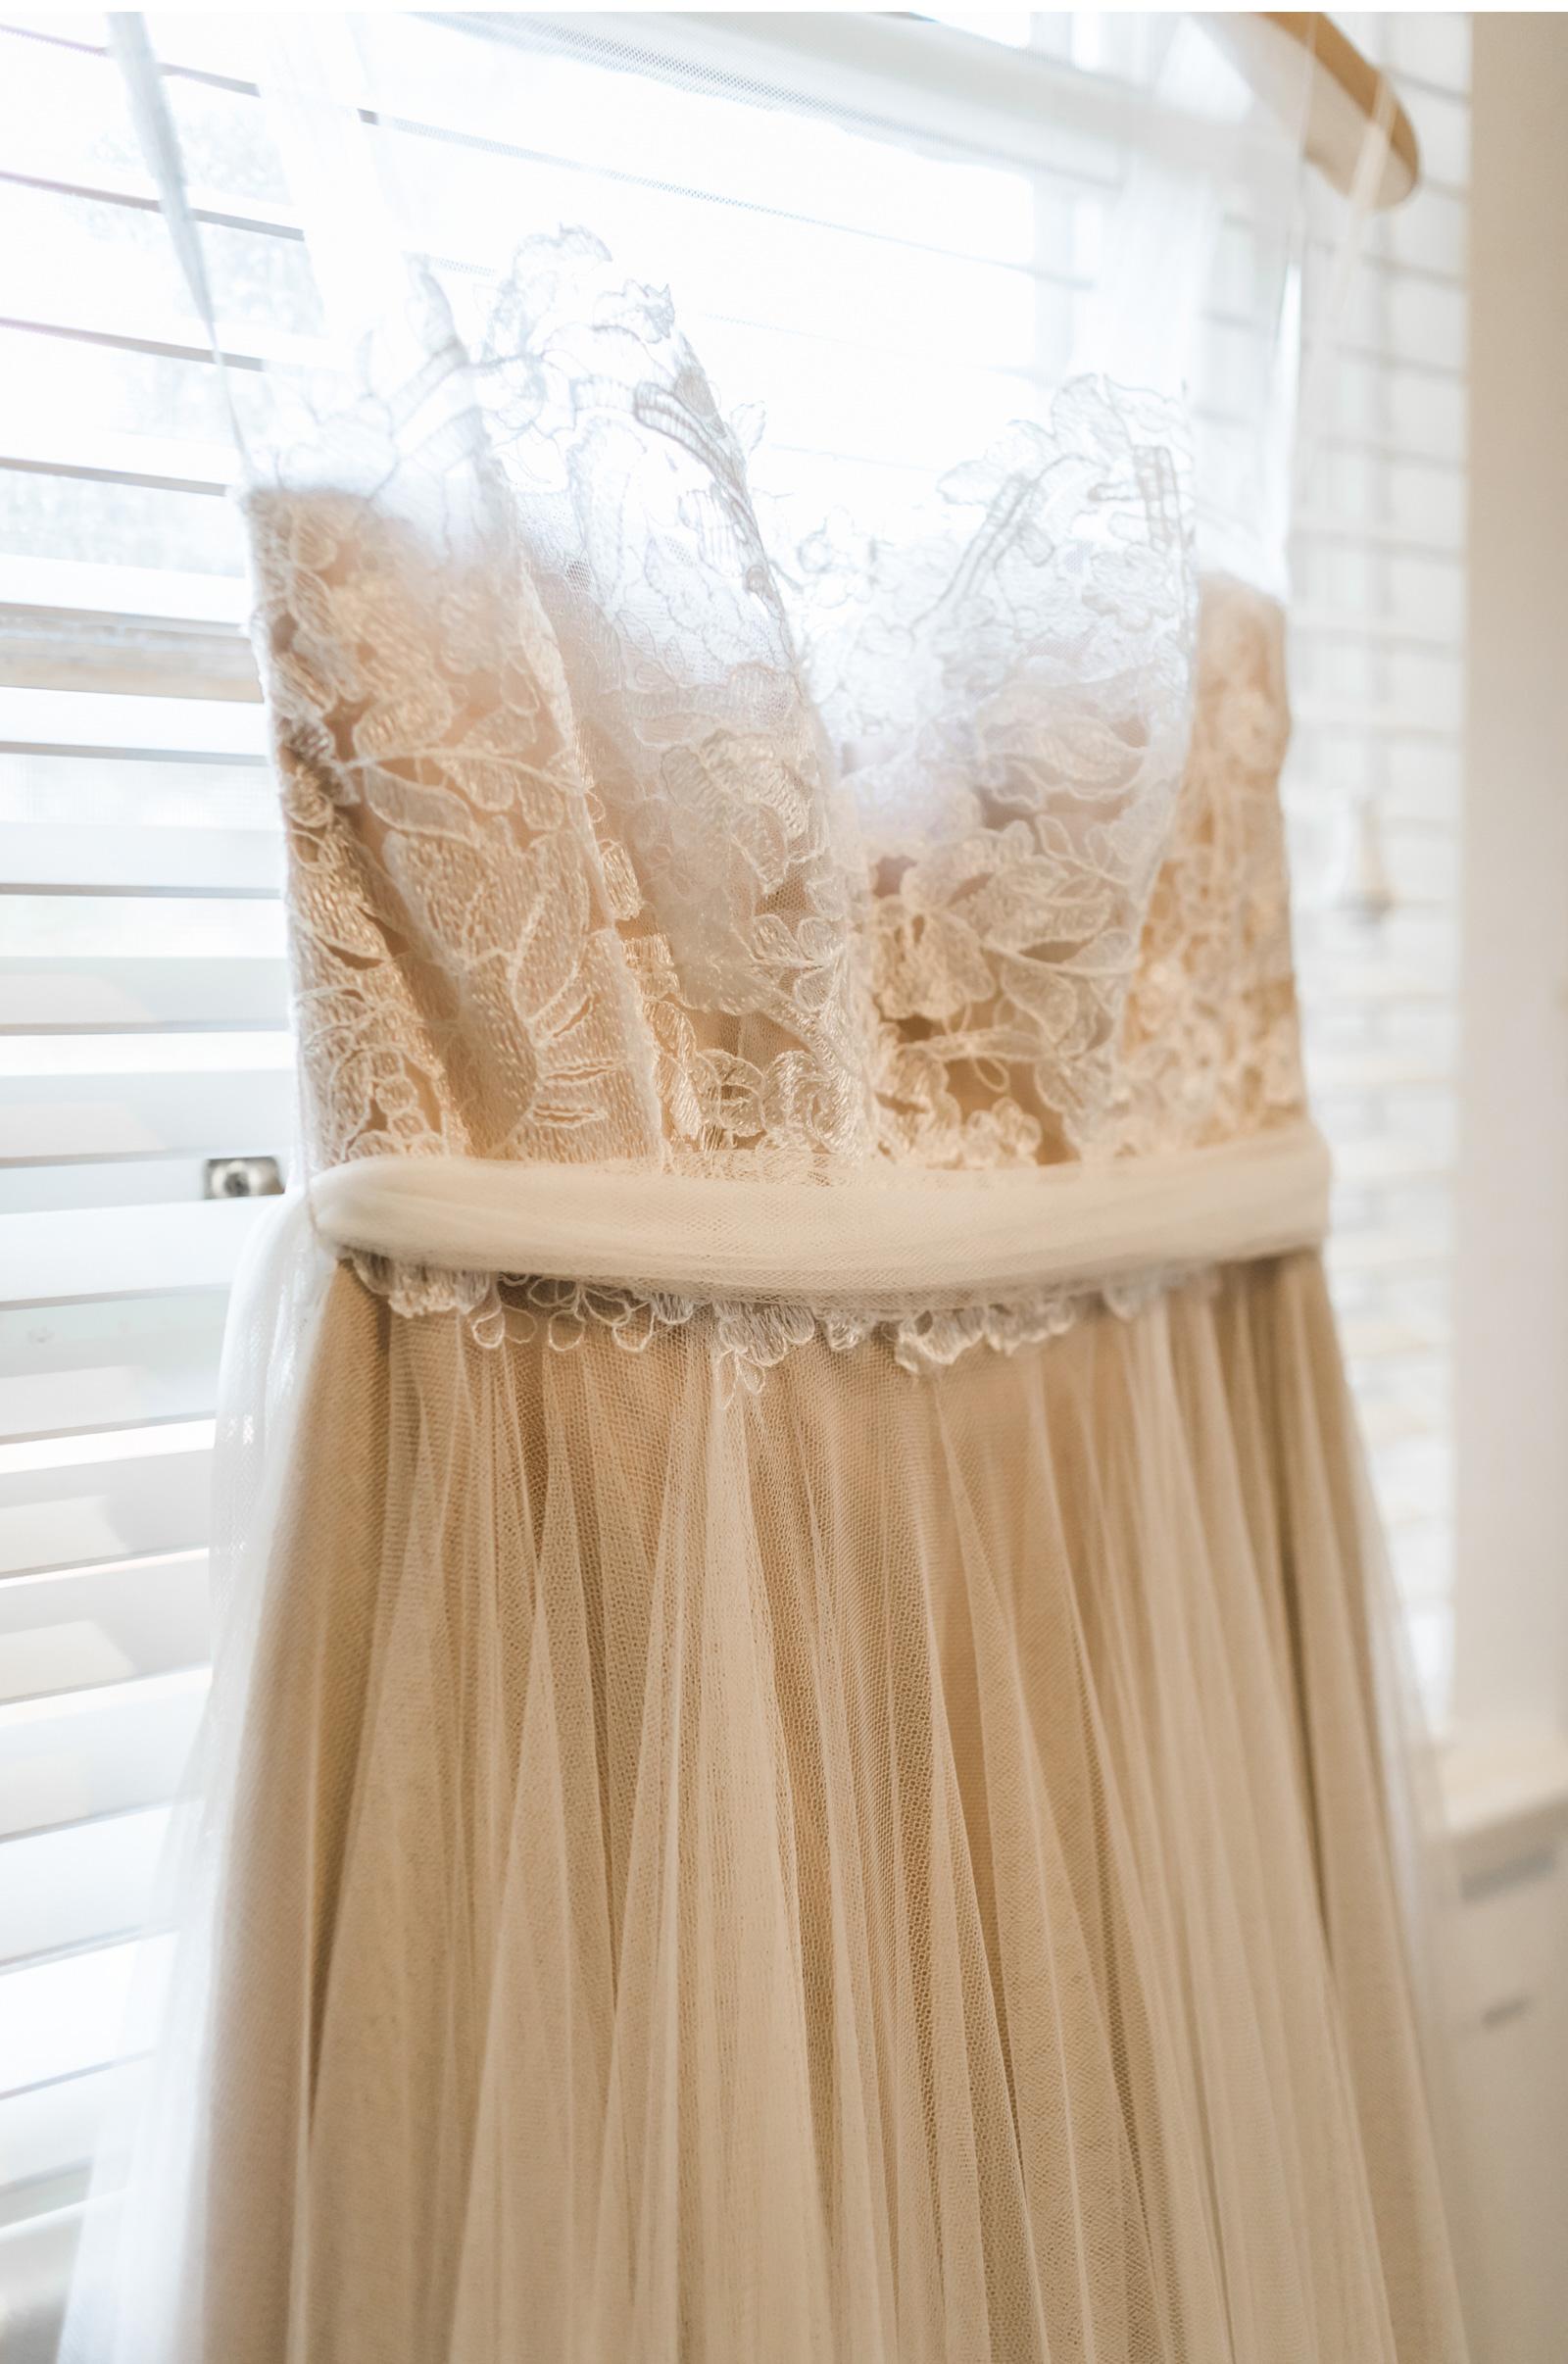 Avila-Beach-Wedding-Style-Me-Pretty-Natalie-Schutt-Photography_01.jpg